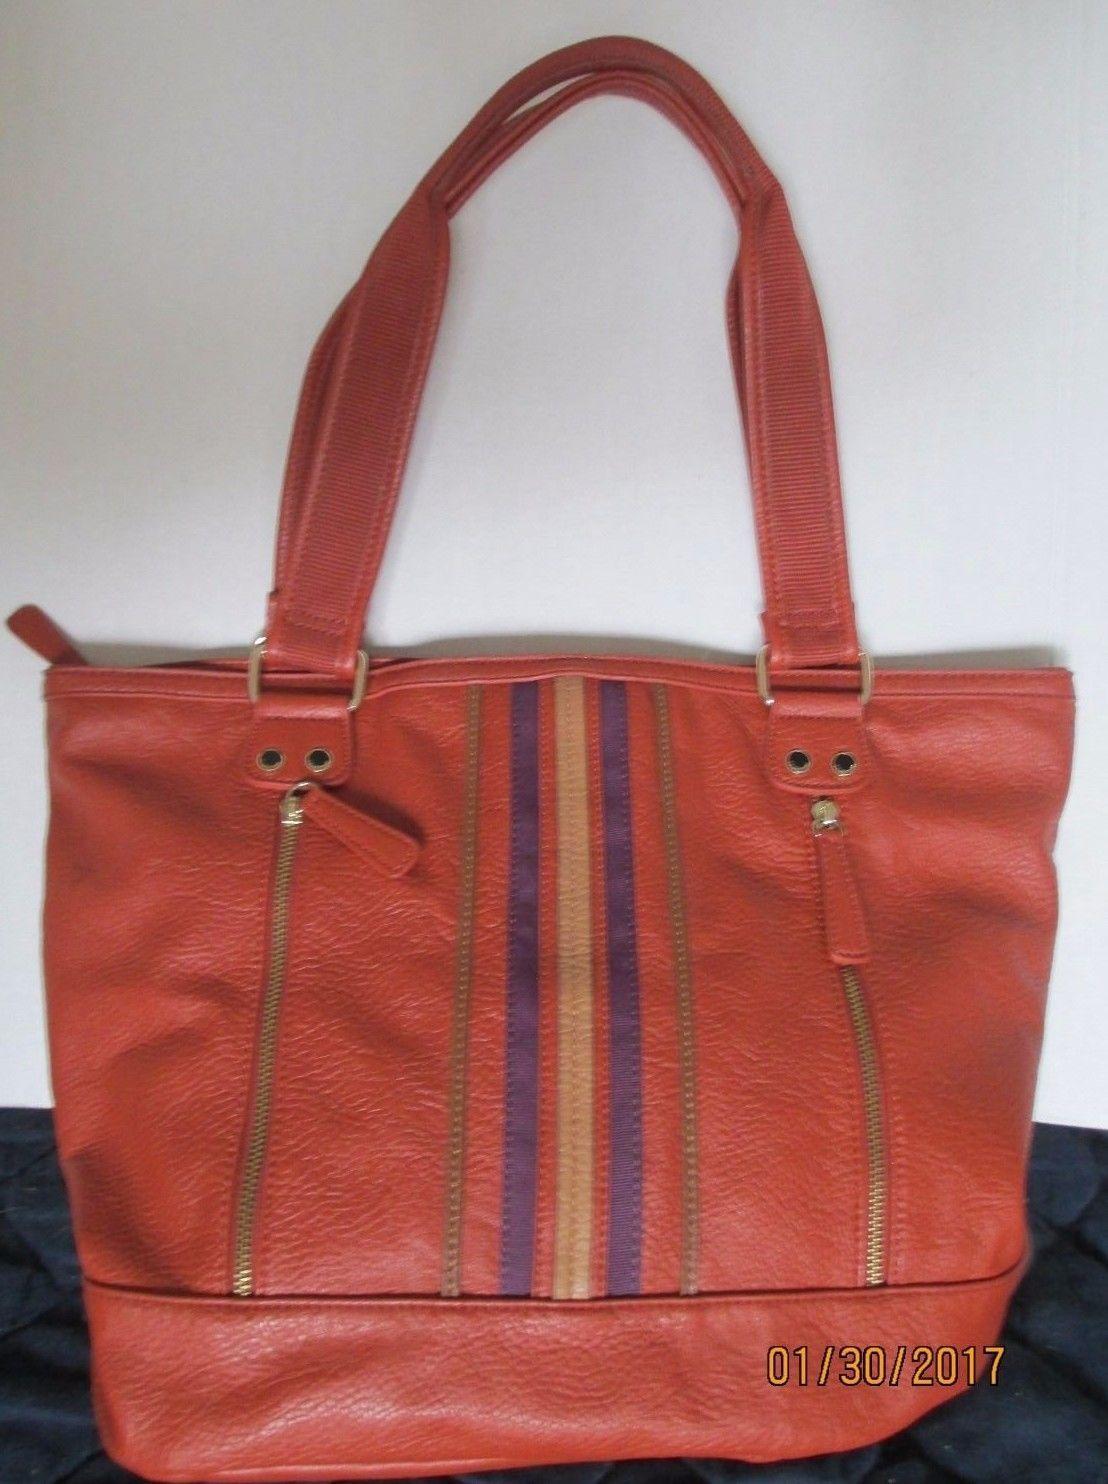 Tyler Rodan Spruce Ex Lg Burnt Orange Tote Handbag Purse 49 50